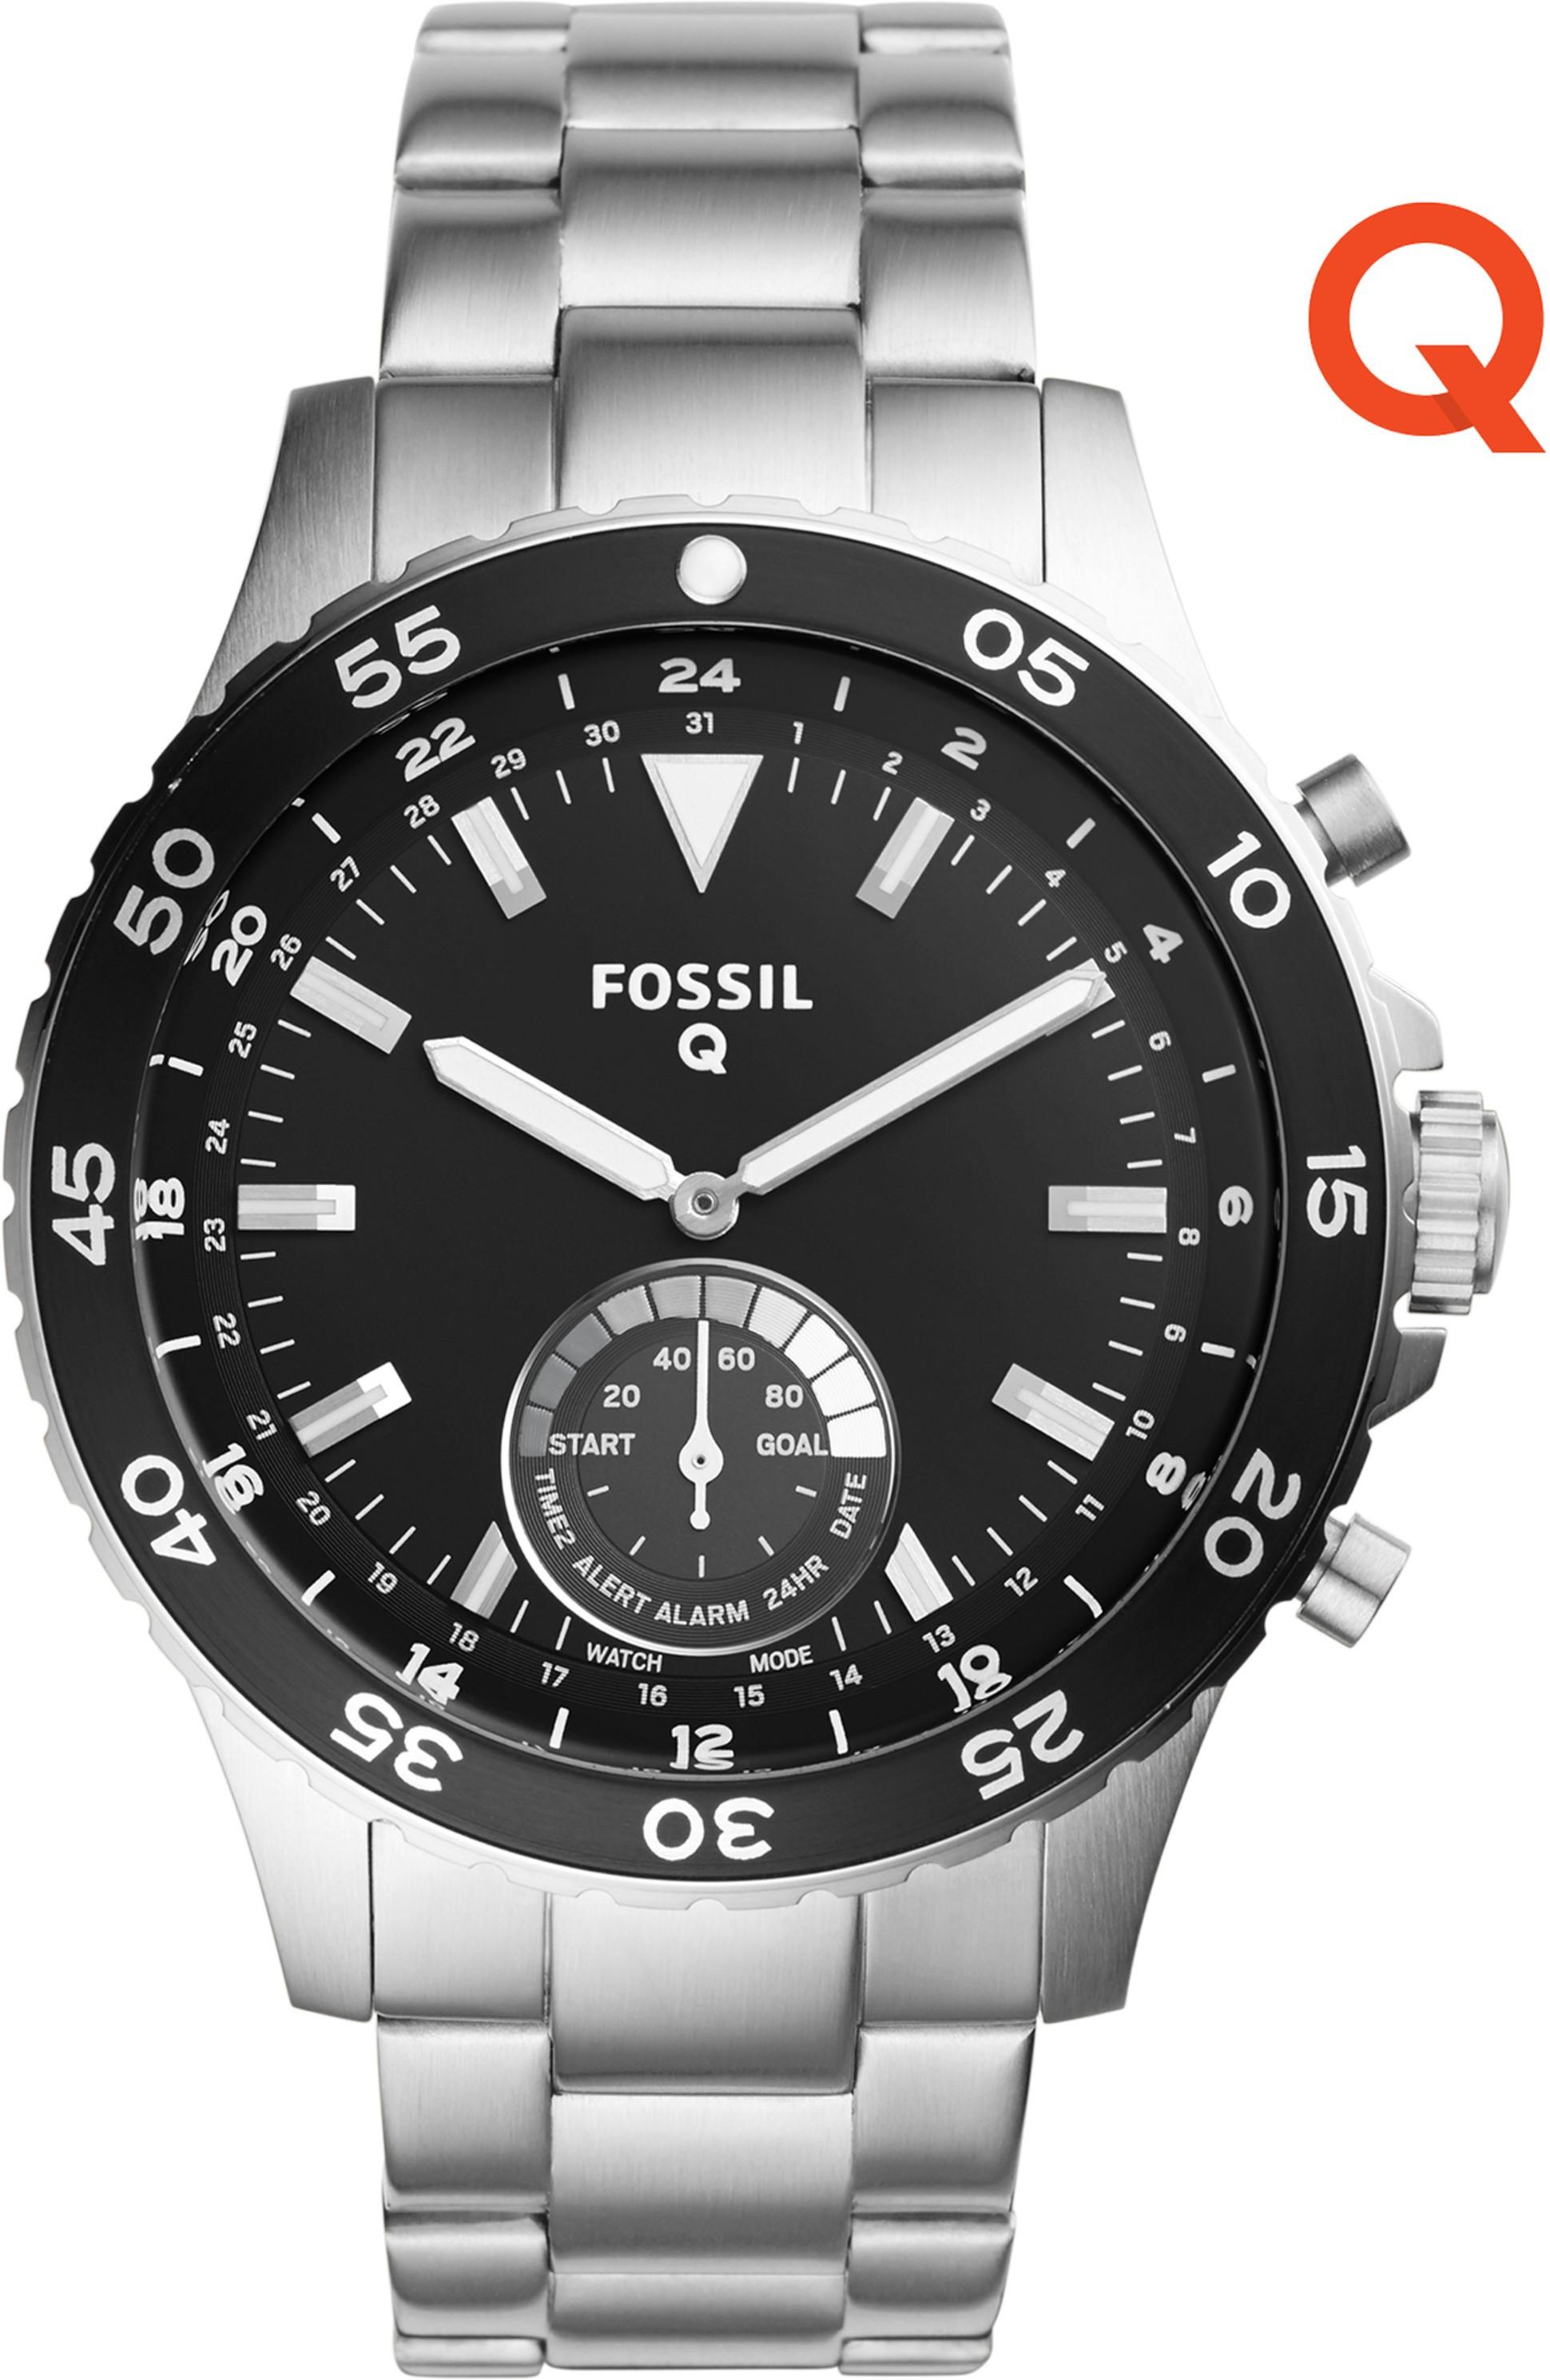 Deals - Raipur - Fossil Q <br> Hybrid Smartwatches<br> Category - wearable_smart_devices<br> Business - Flipkart.com